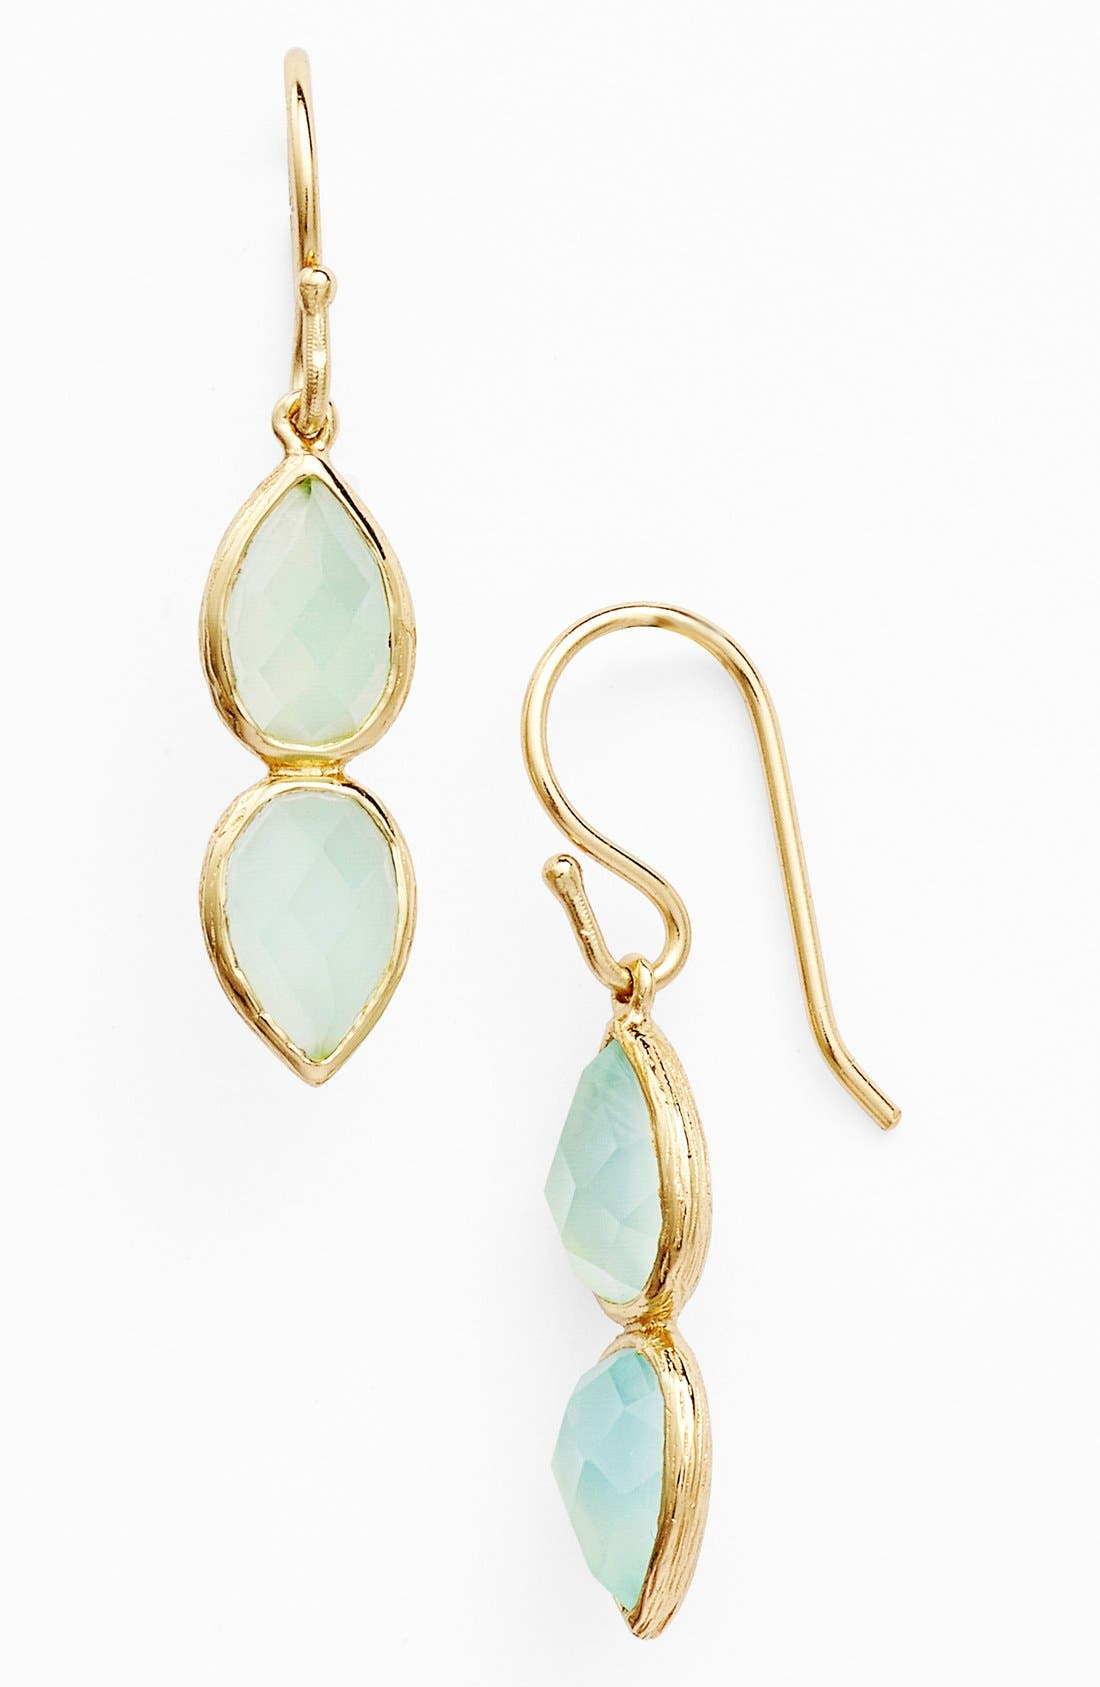 Main Image - Melinda Maria 'June - Leaf' Drop Earrings